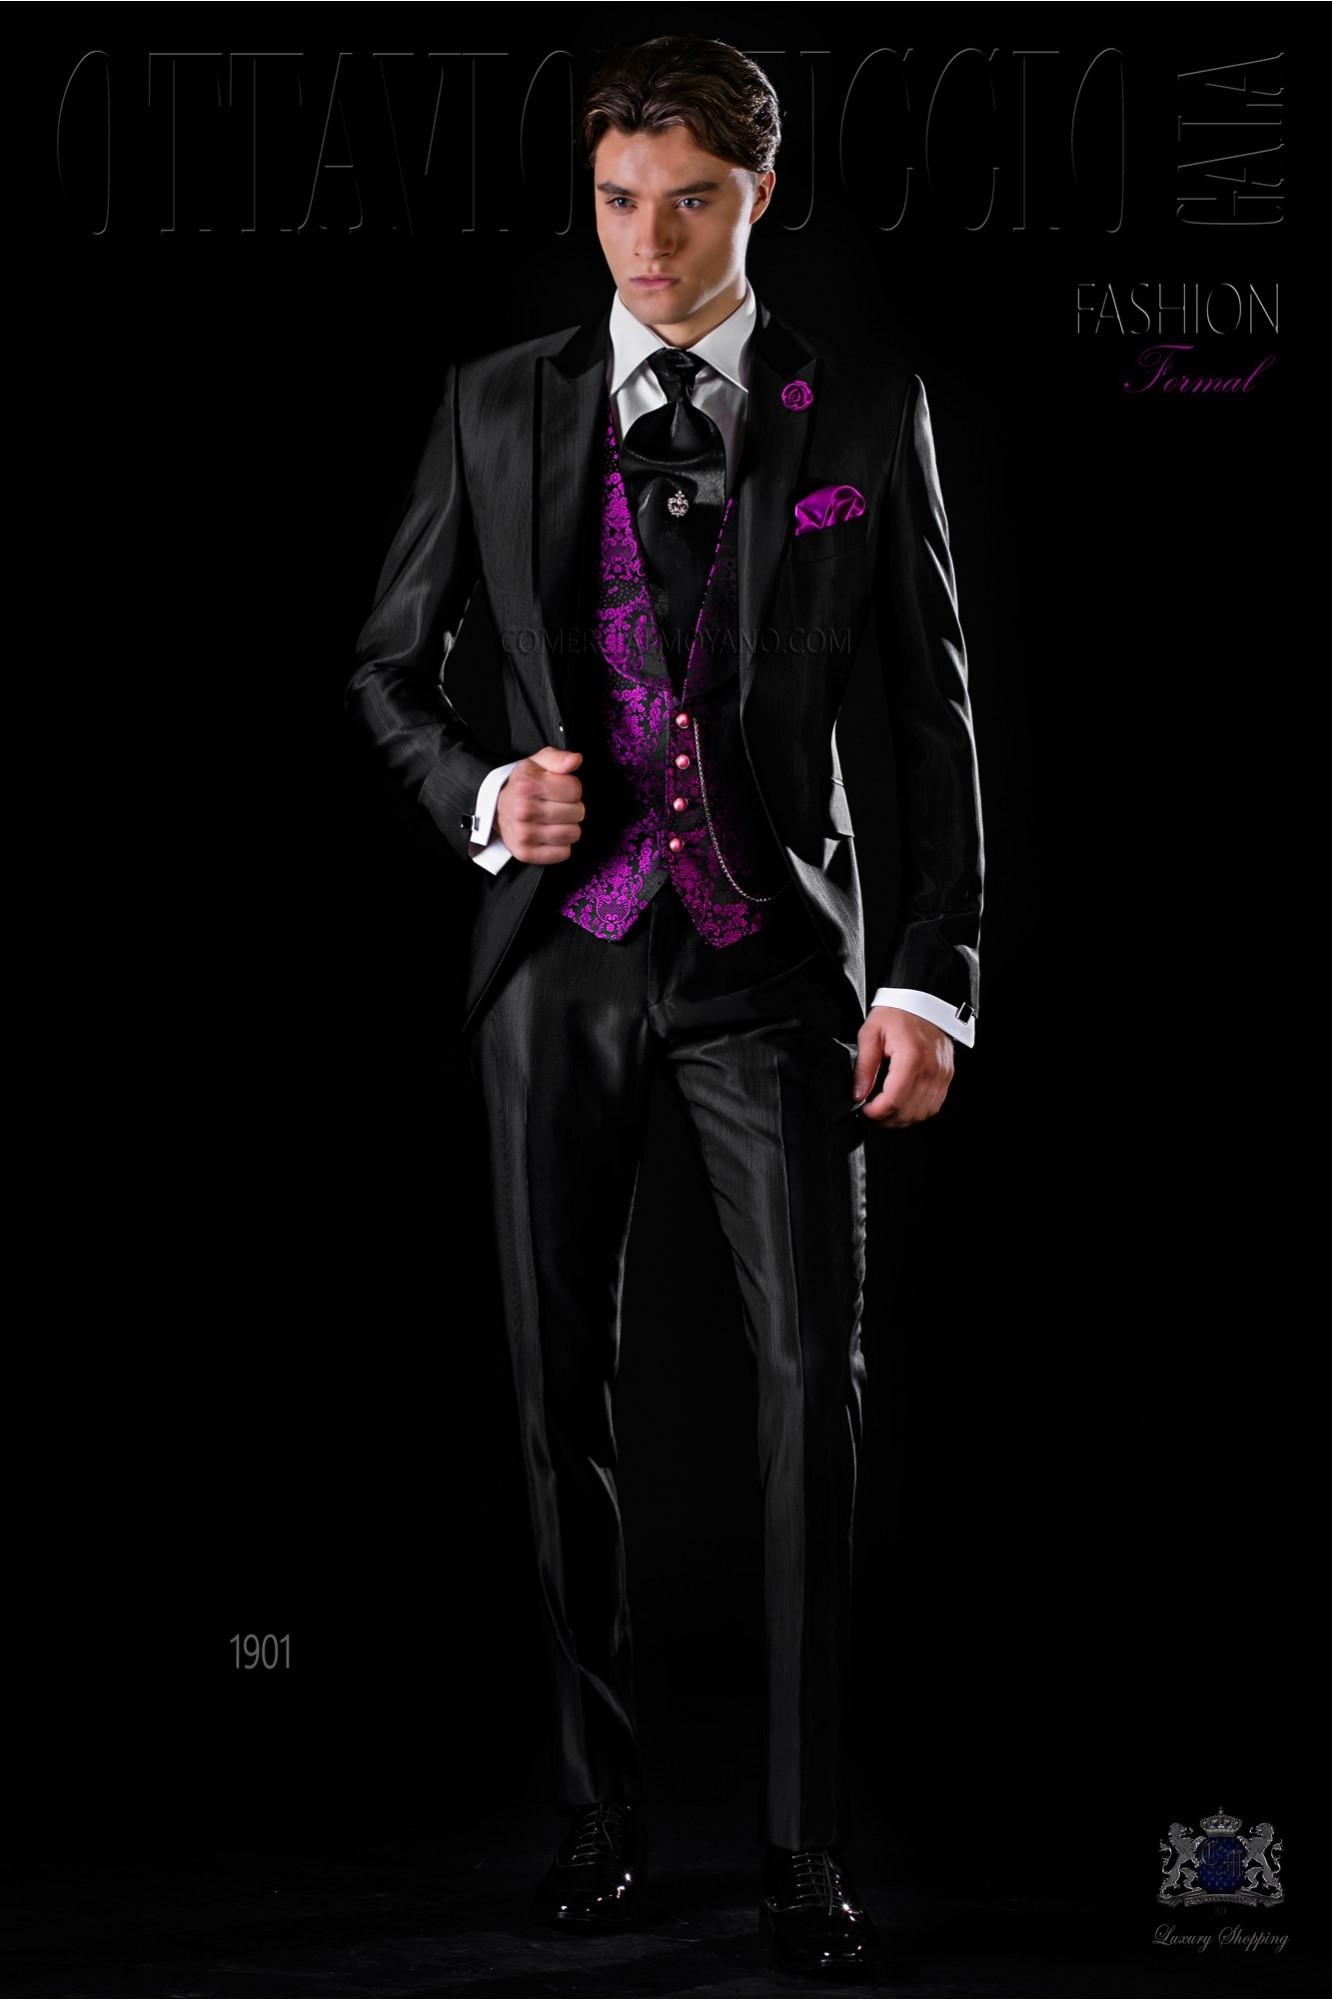 Traje de novio moderno negro con vivos de raso modelo: 1901 Ottavio Nuccio Gala colección Fashion